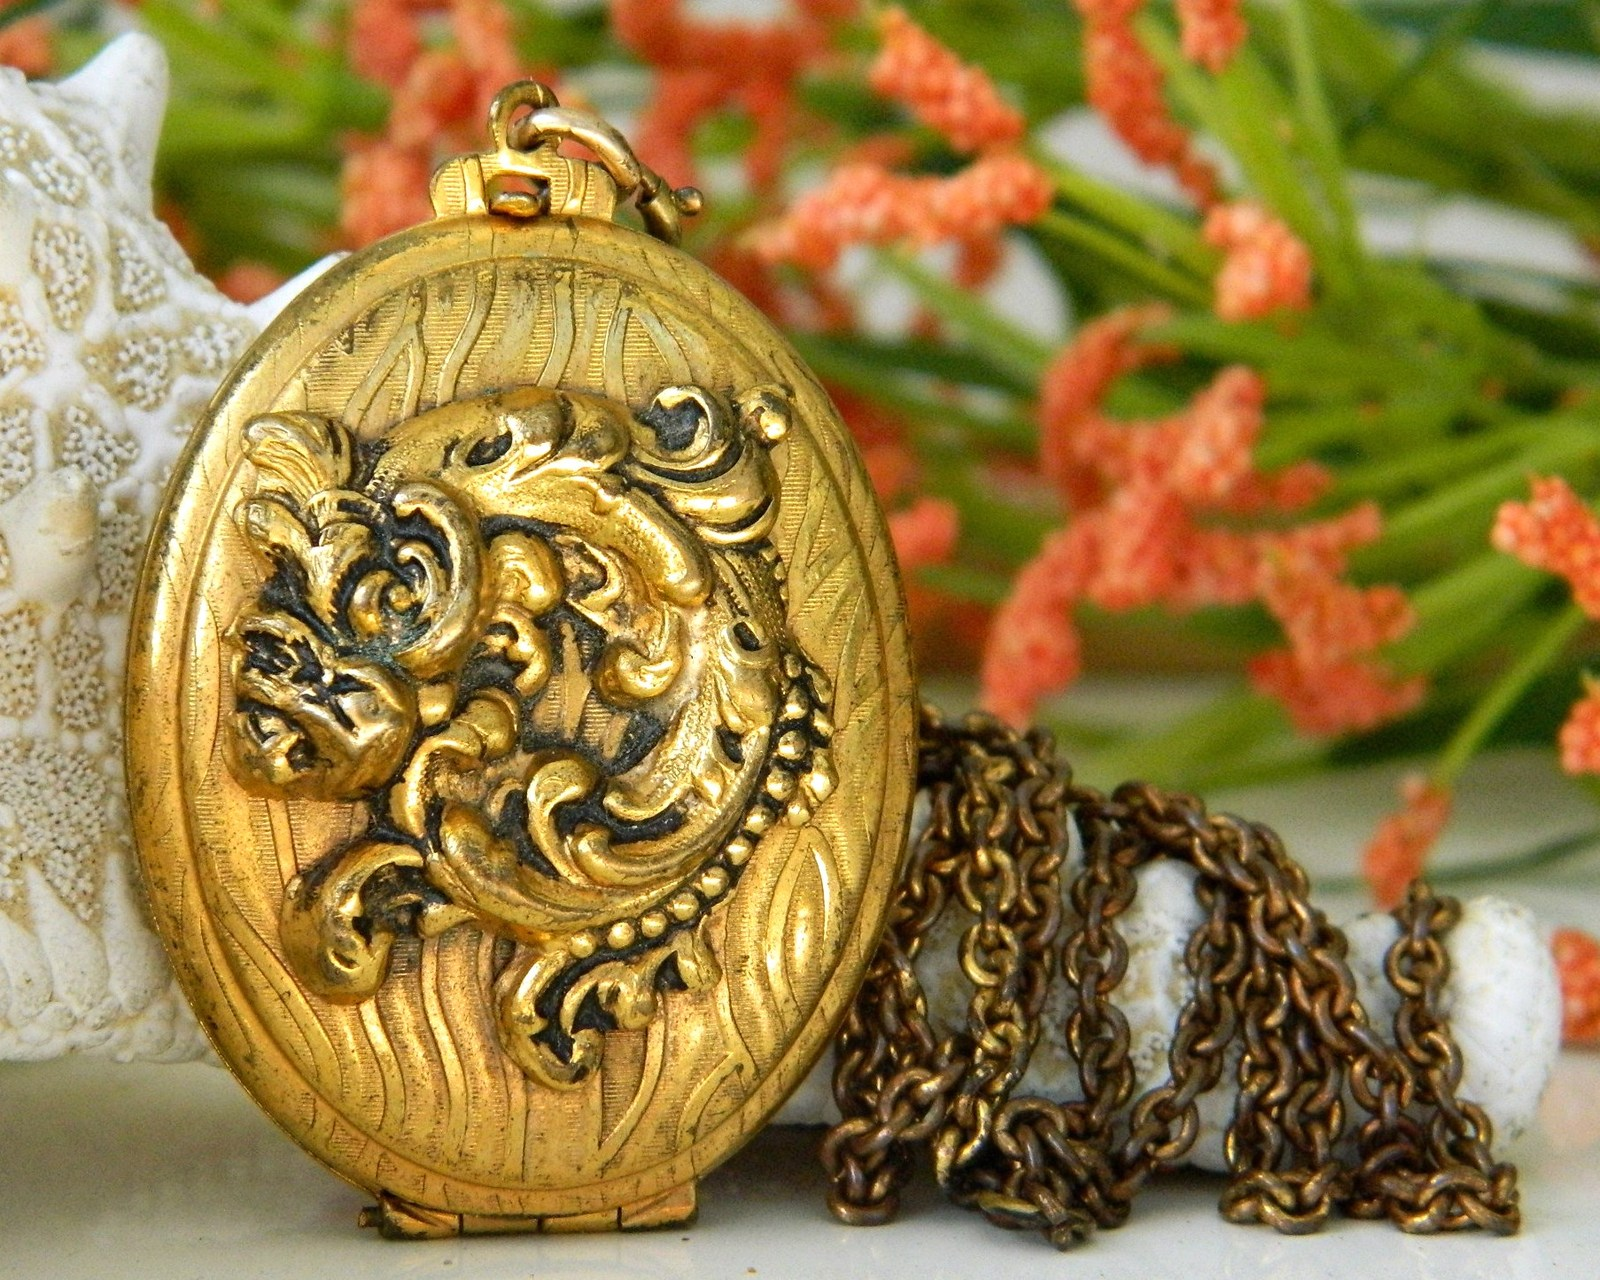 Vintage Antiqued Brass Locket Pendant Necklace Chain Gold Black Floral